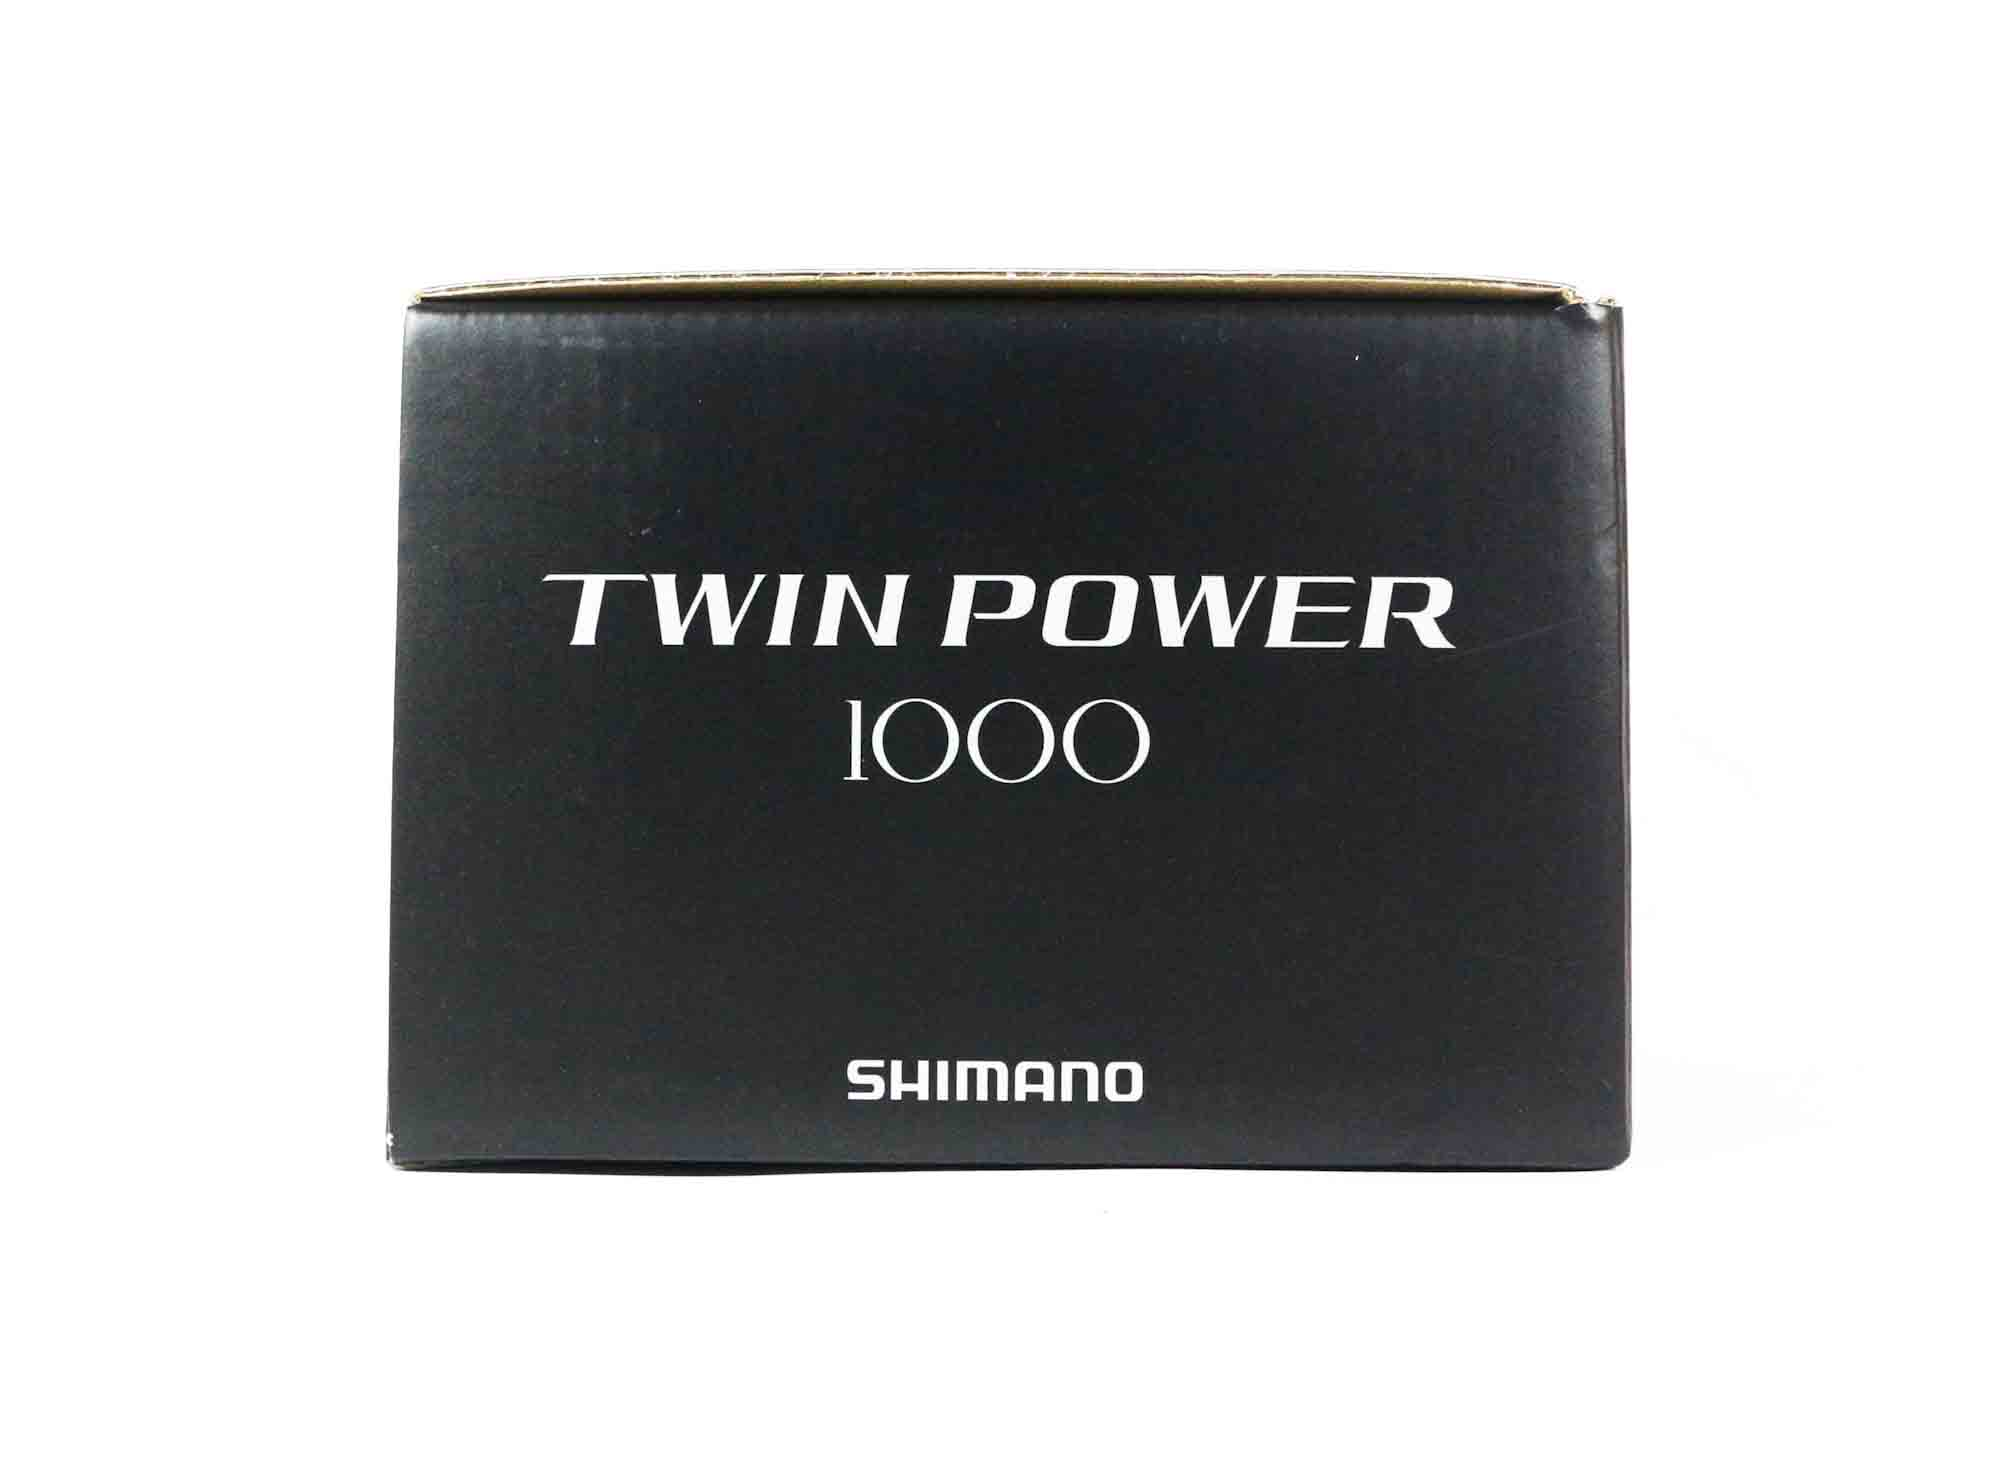 Shimano Reel Spinning Twinpower FD 1000 2020 (2248)